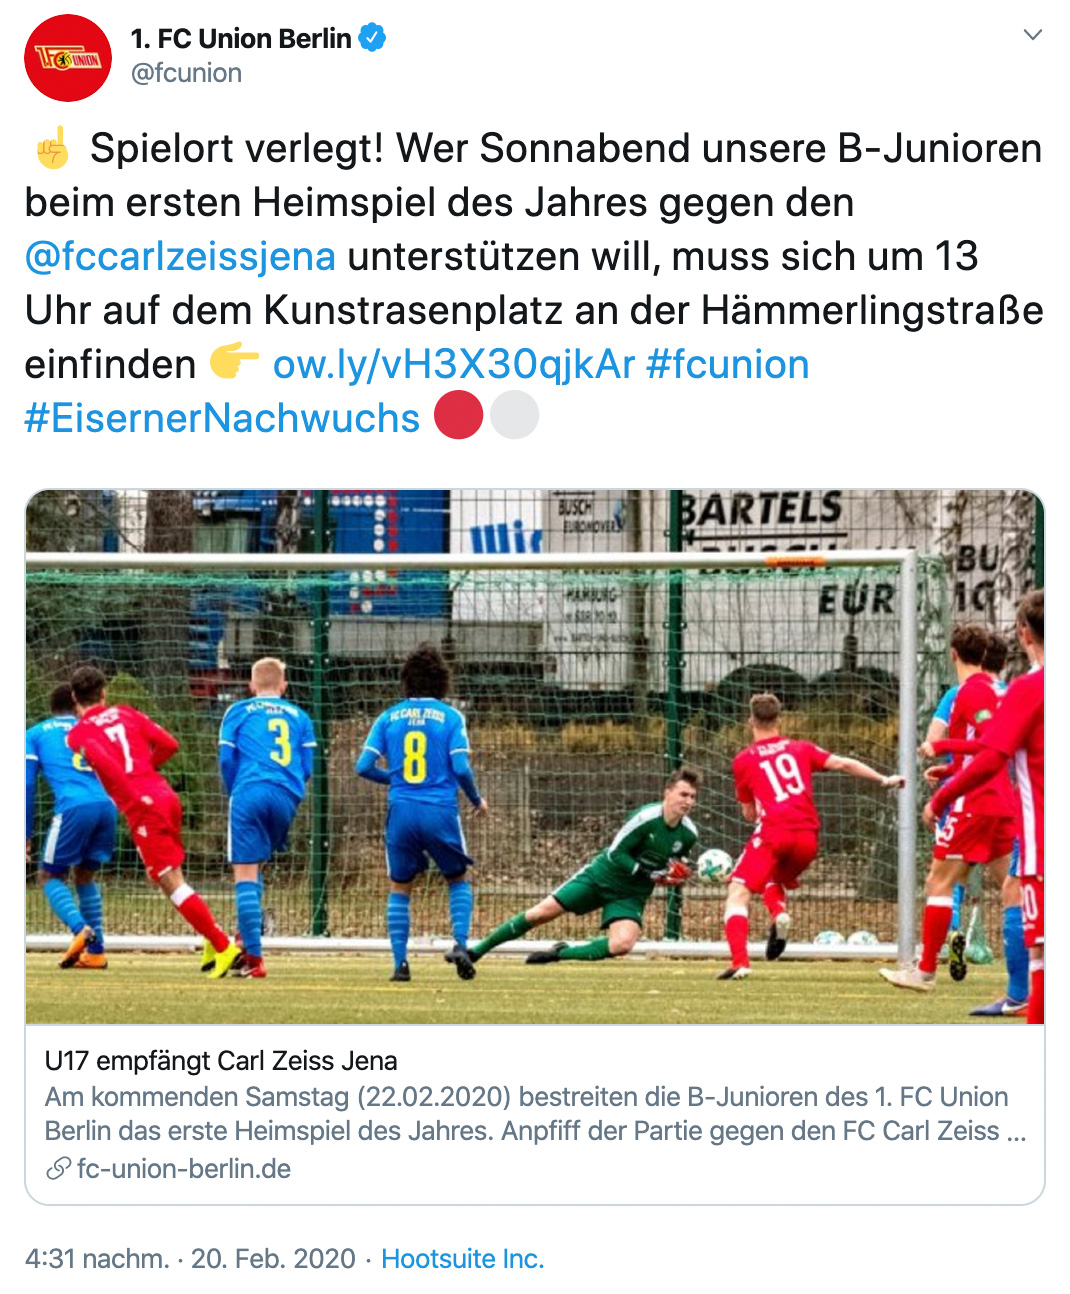 U17 des 1. FC Union Berlin spielt ausnahmsweise auf dem Kunstrasenplatz an der Hämmerlingstraße gegen den FC Carl Zeiss Jena